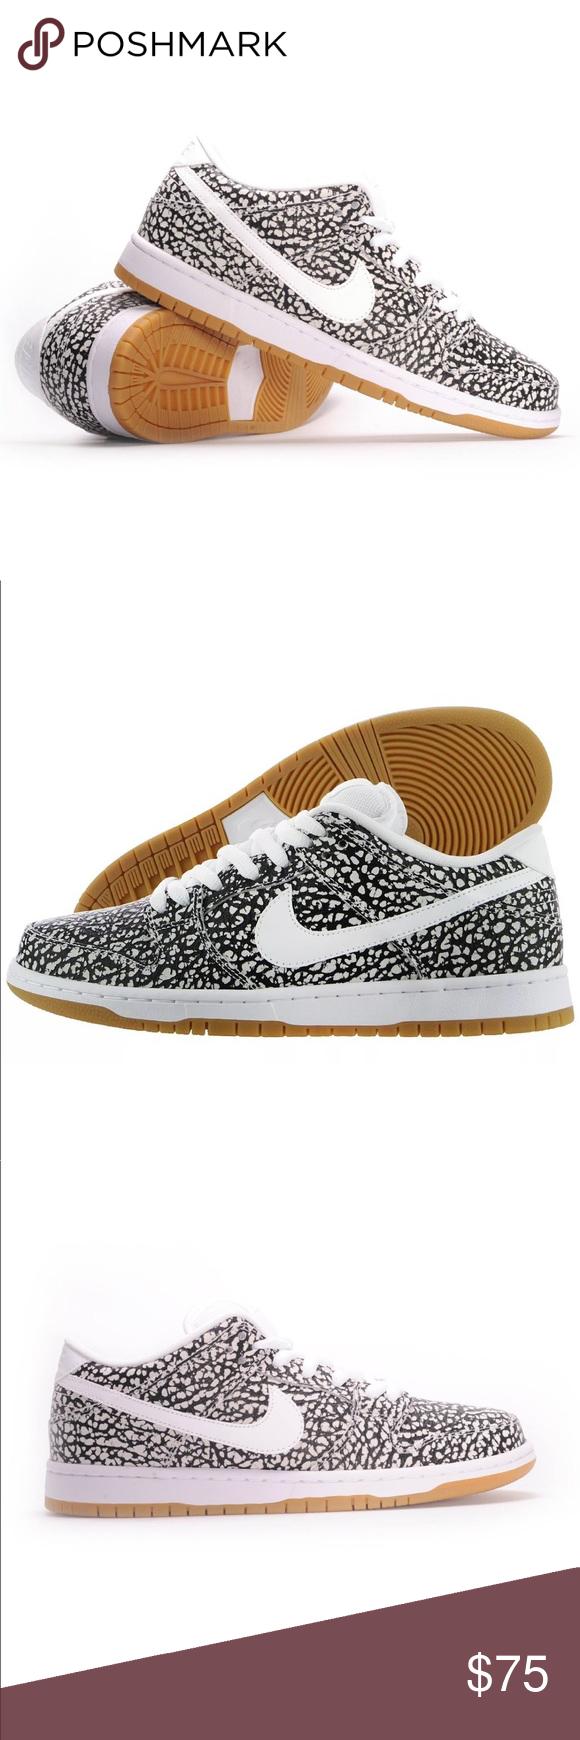 size 40 cff3c 671b2 Nike SB Dunk Low Sneakers Mens Size 11.5. Asphalt RoadBlack ...